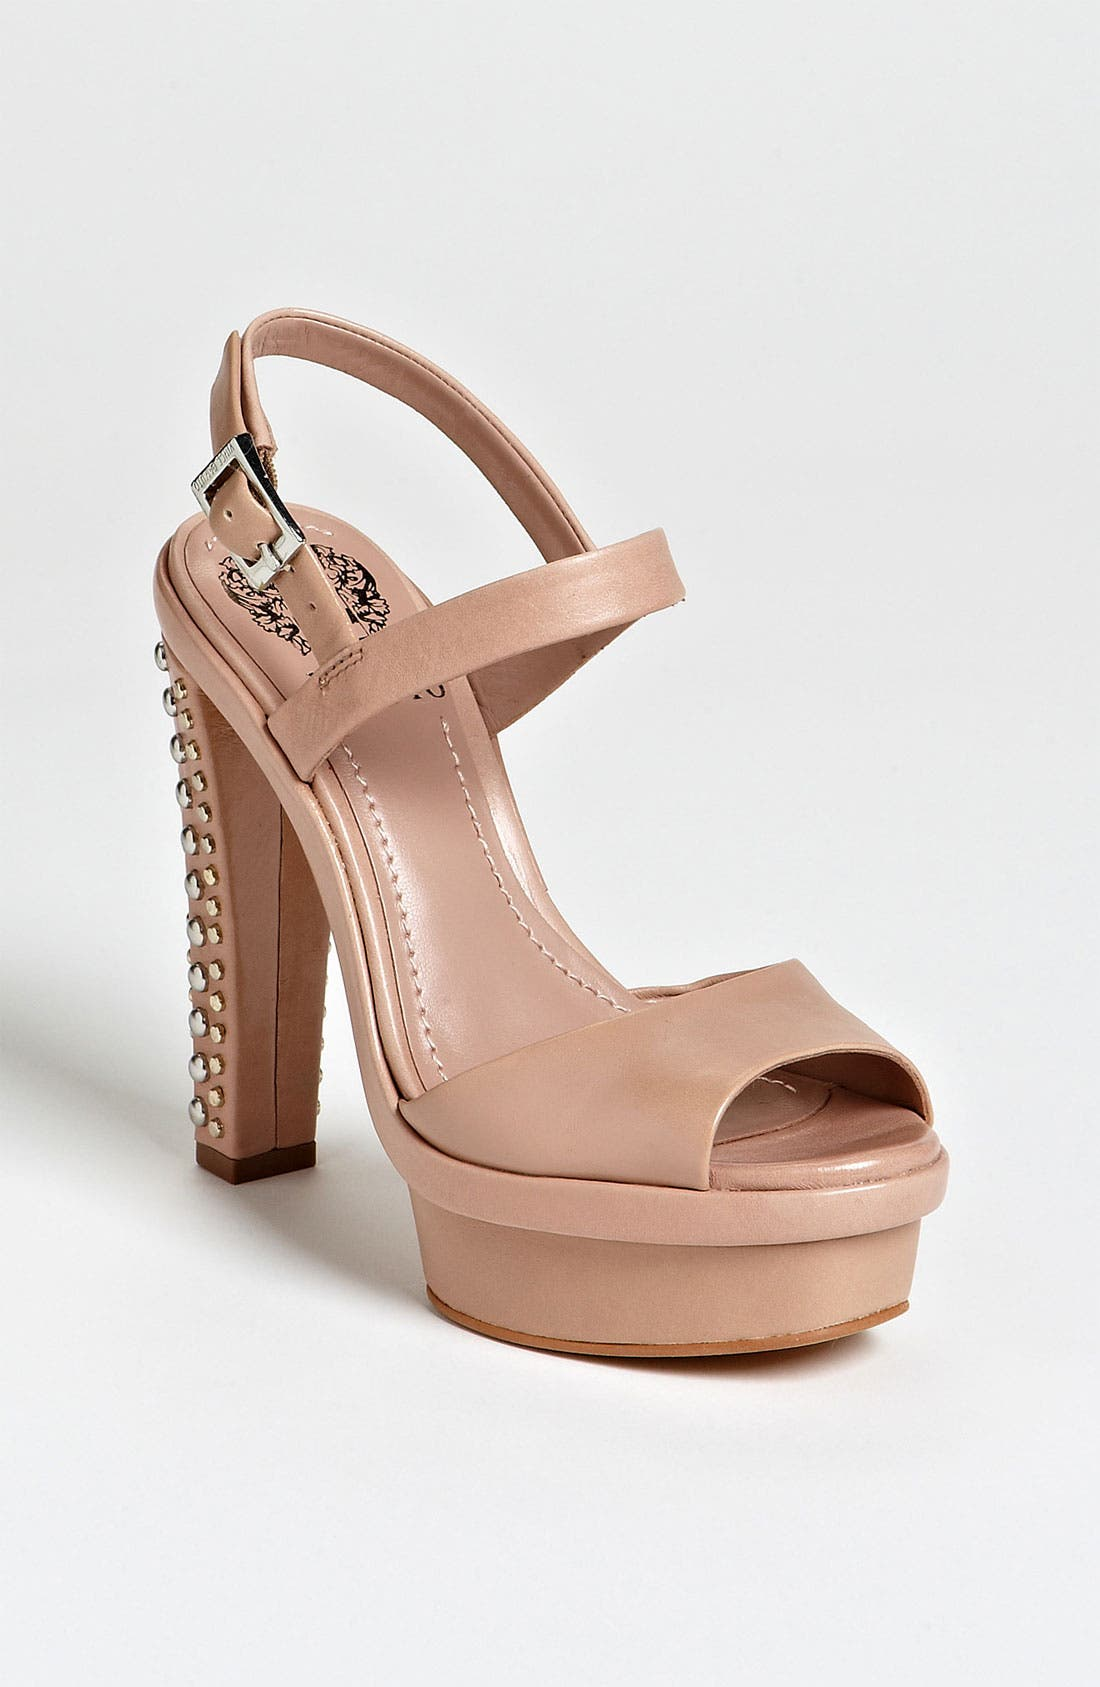 Main Image - Vince Camuto 'Cairo' Sandal